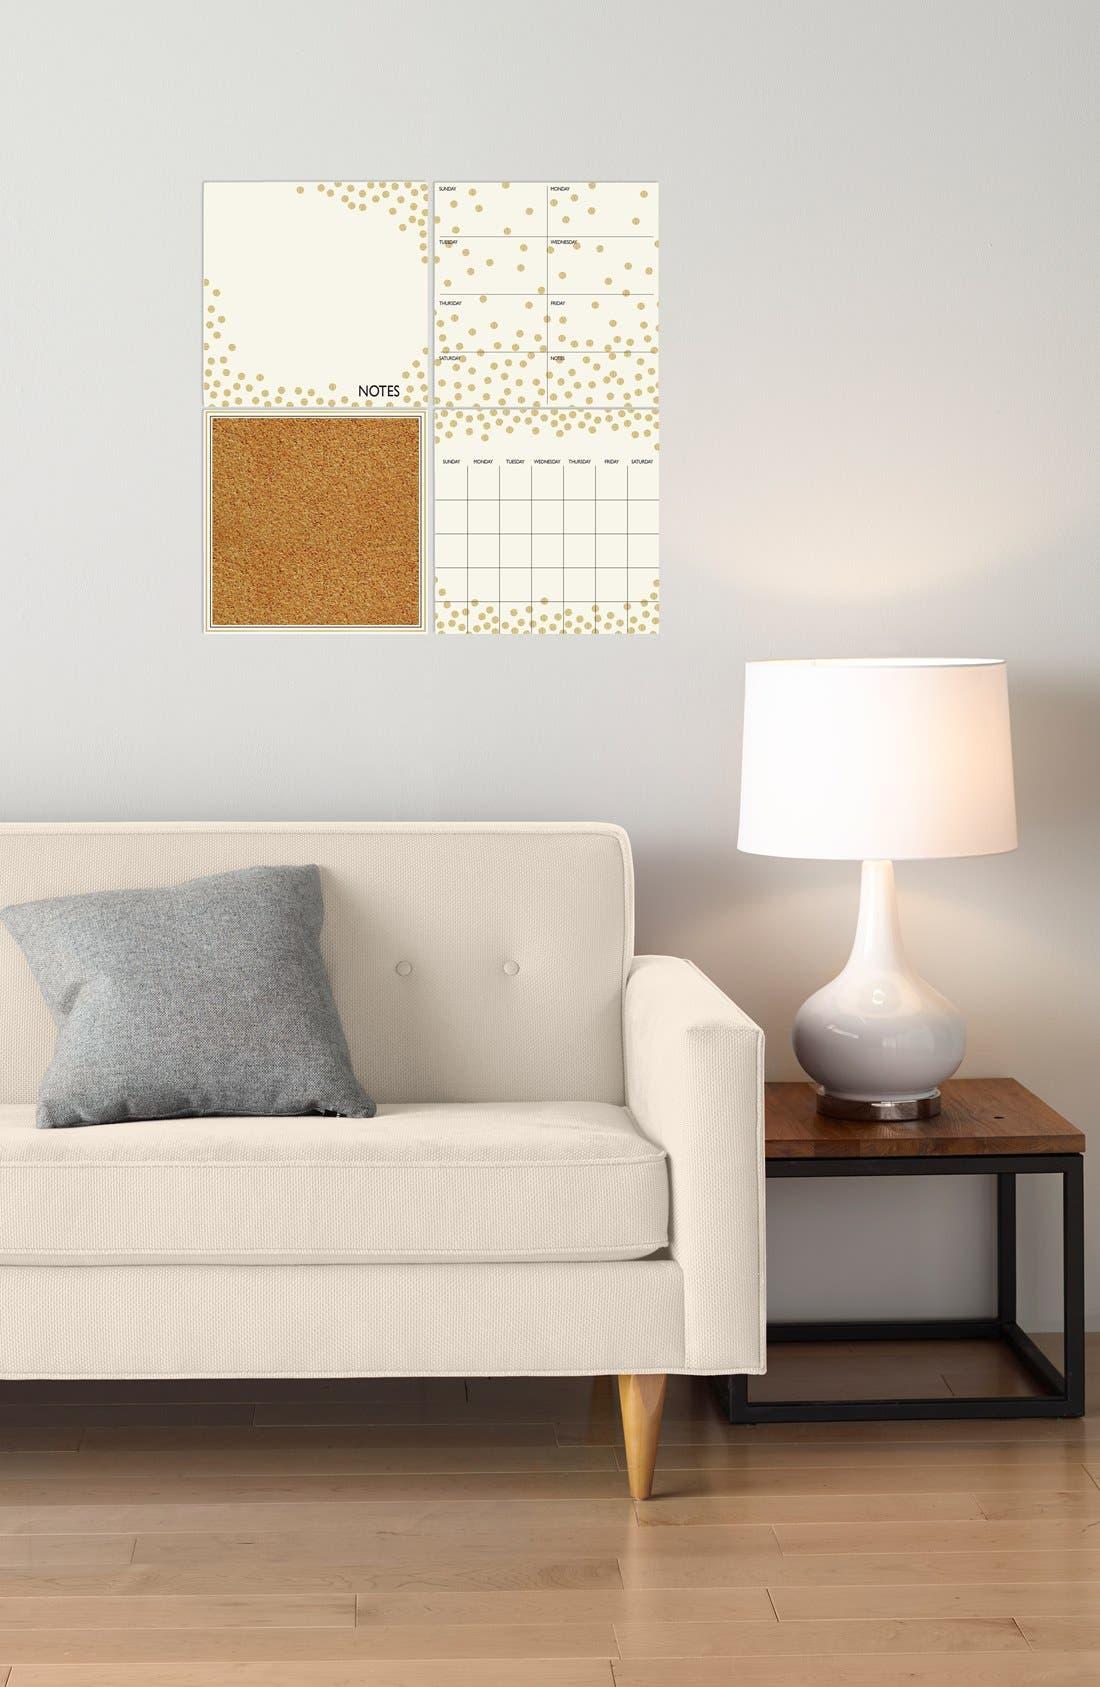 'Confetti' Wall Decal Organization Kit,                             Alternate thumbnail 3, color,                             710